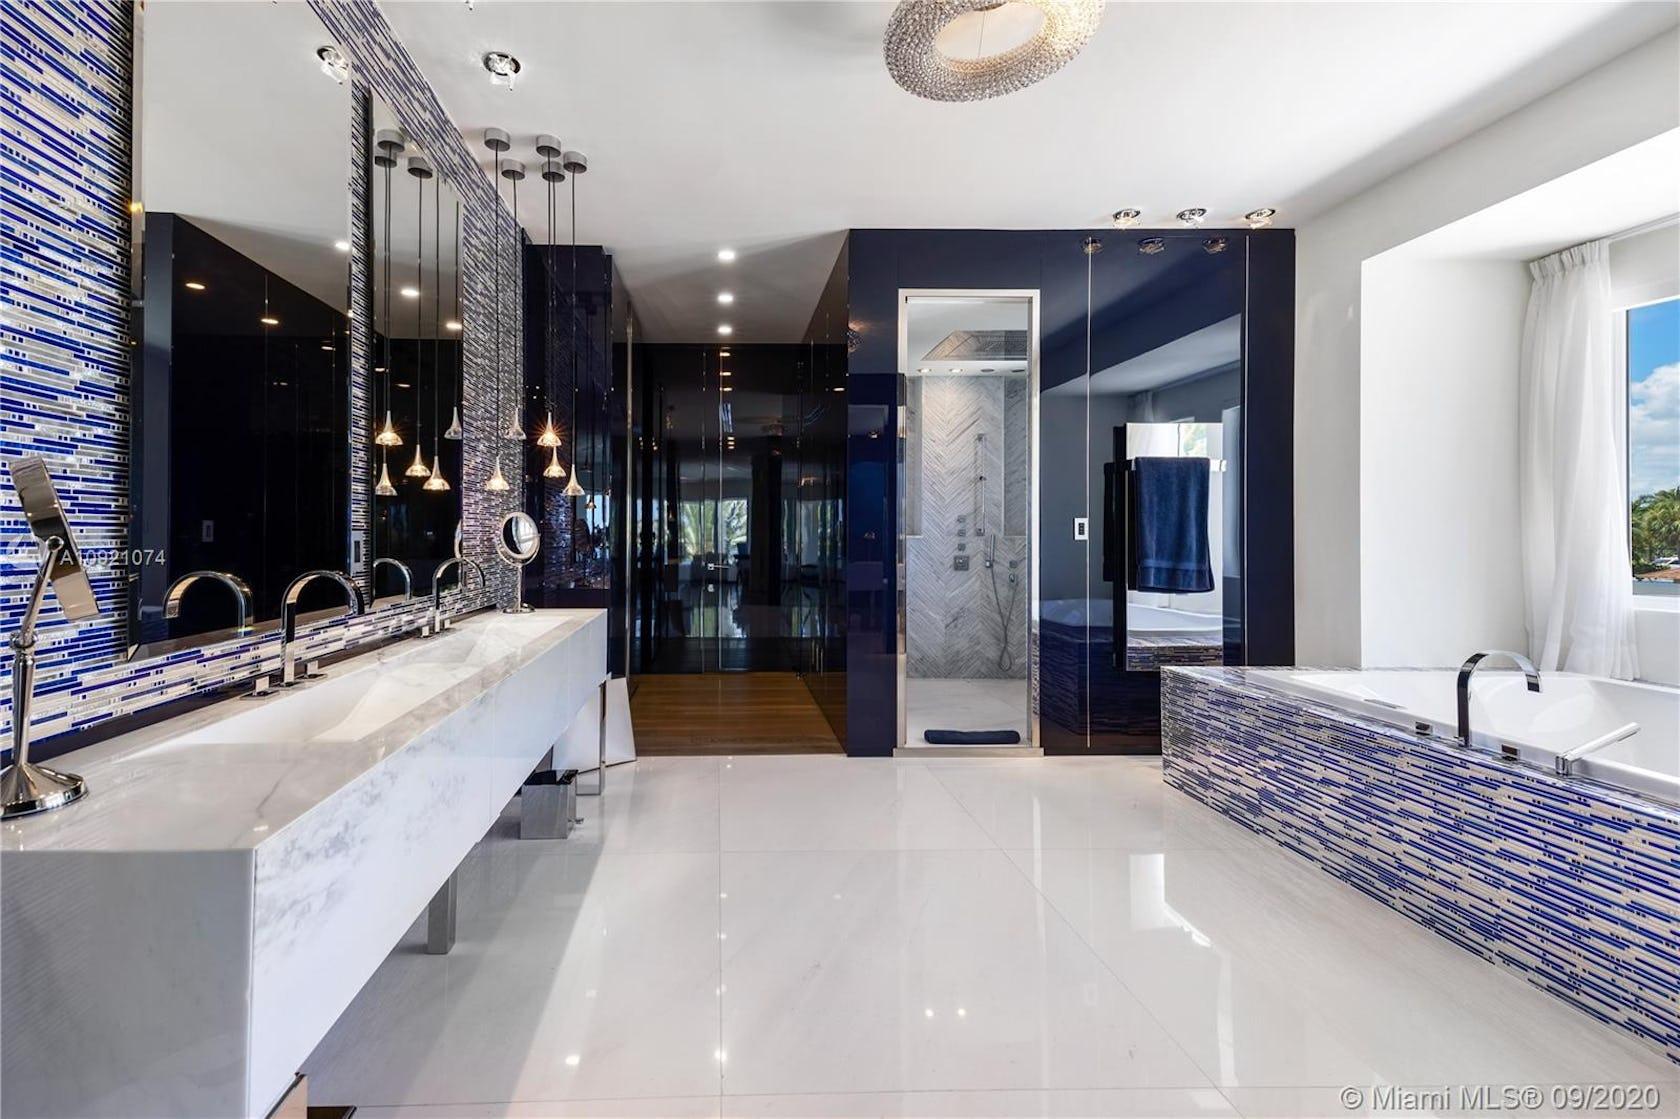 floor flooring lobby indoors room interior design